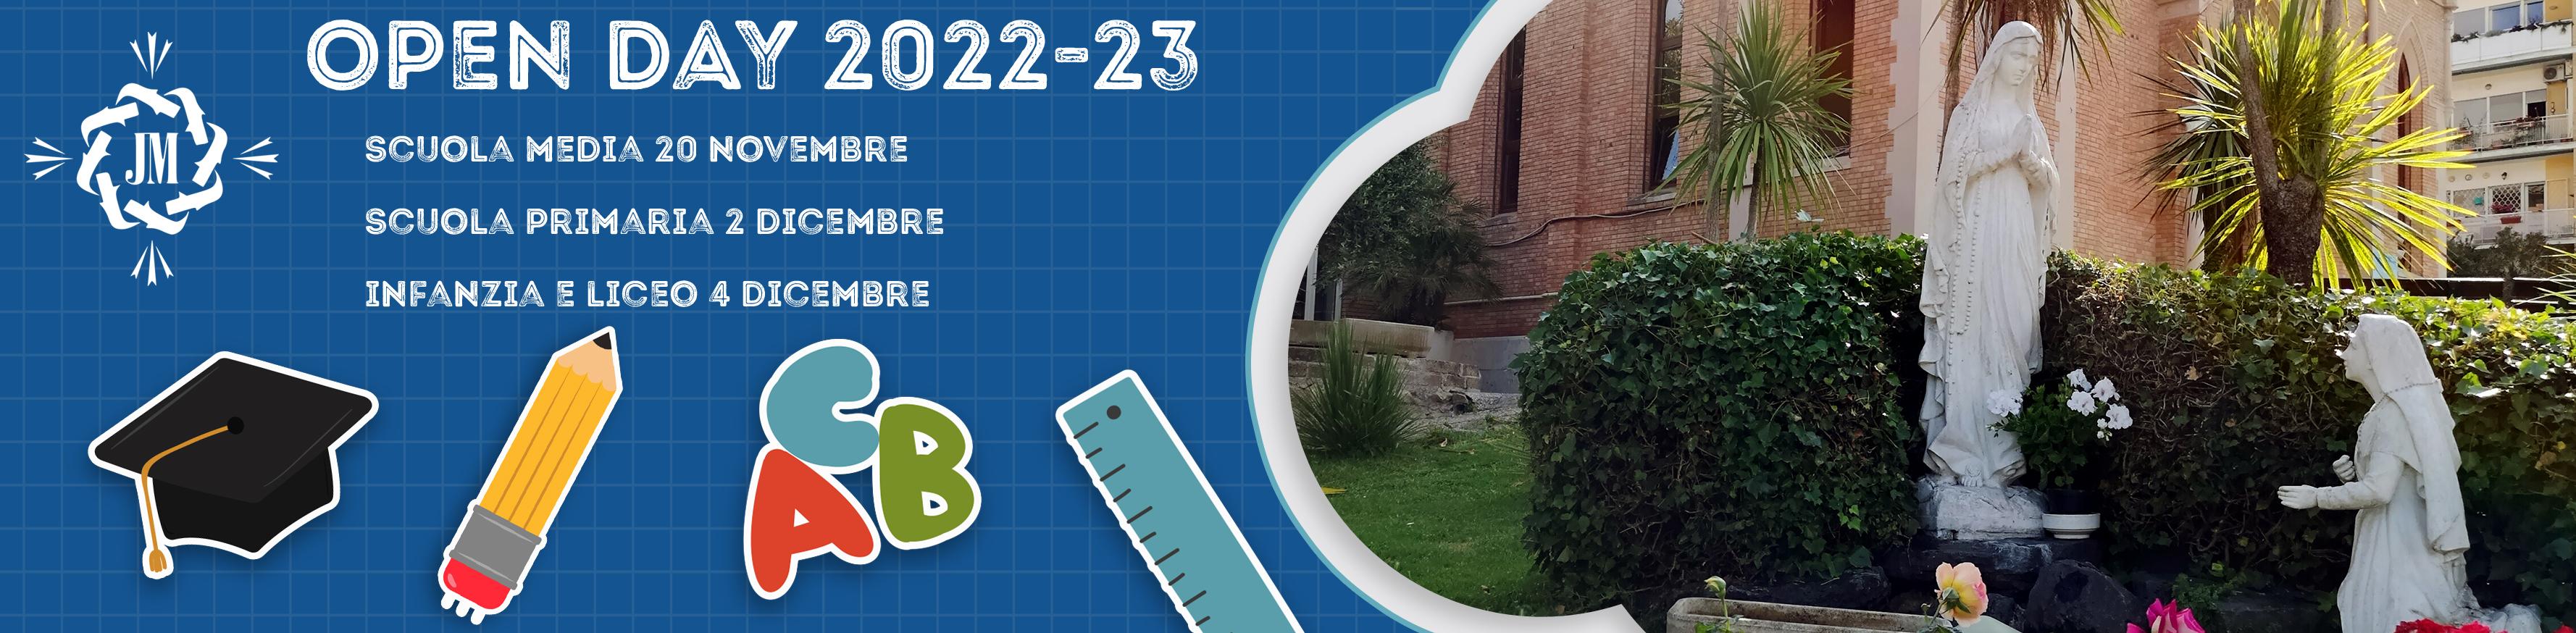 slide_openday_2022-23